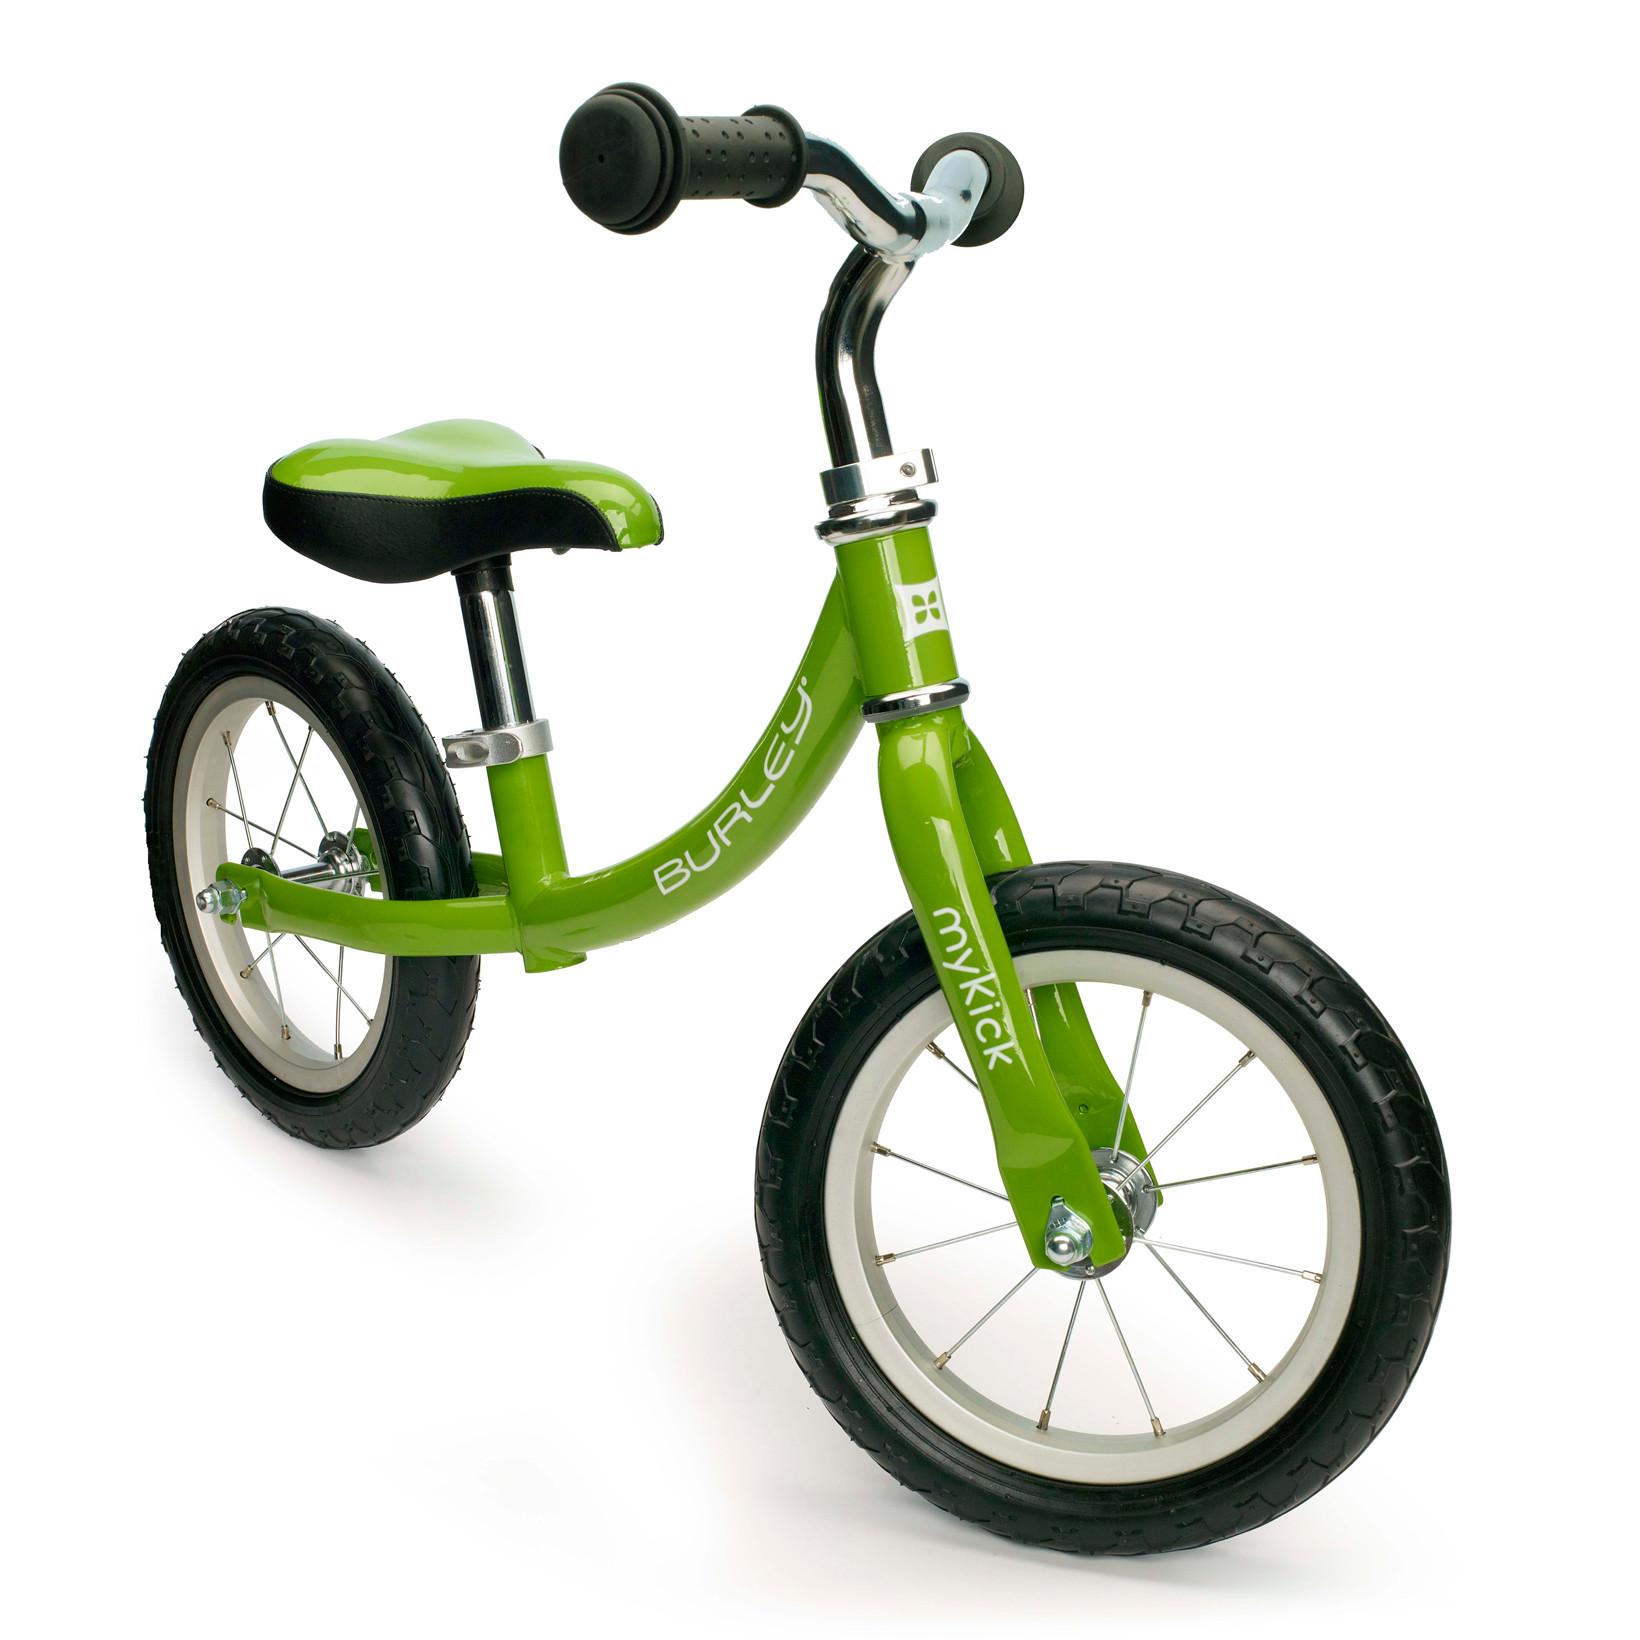 Burley MyKick Løbecykel | City-cykler